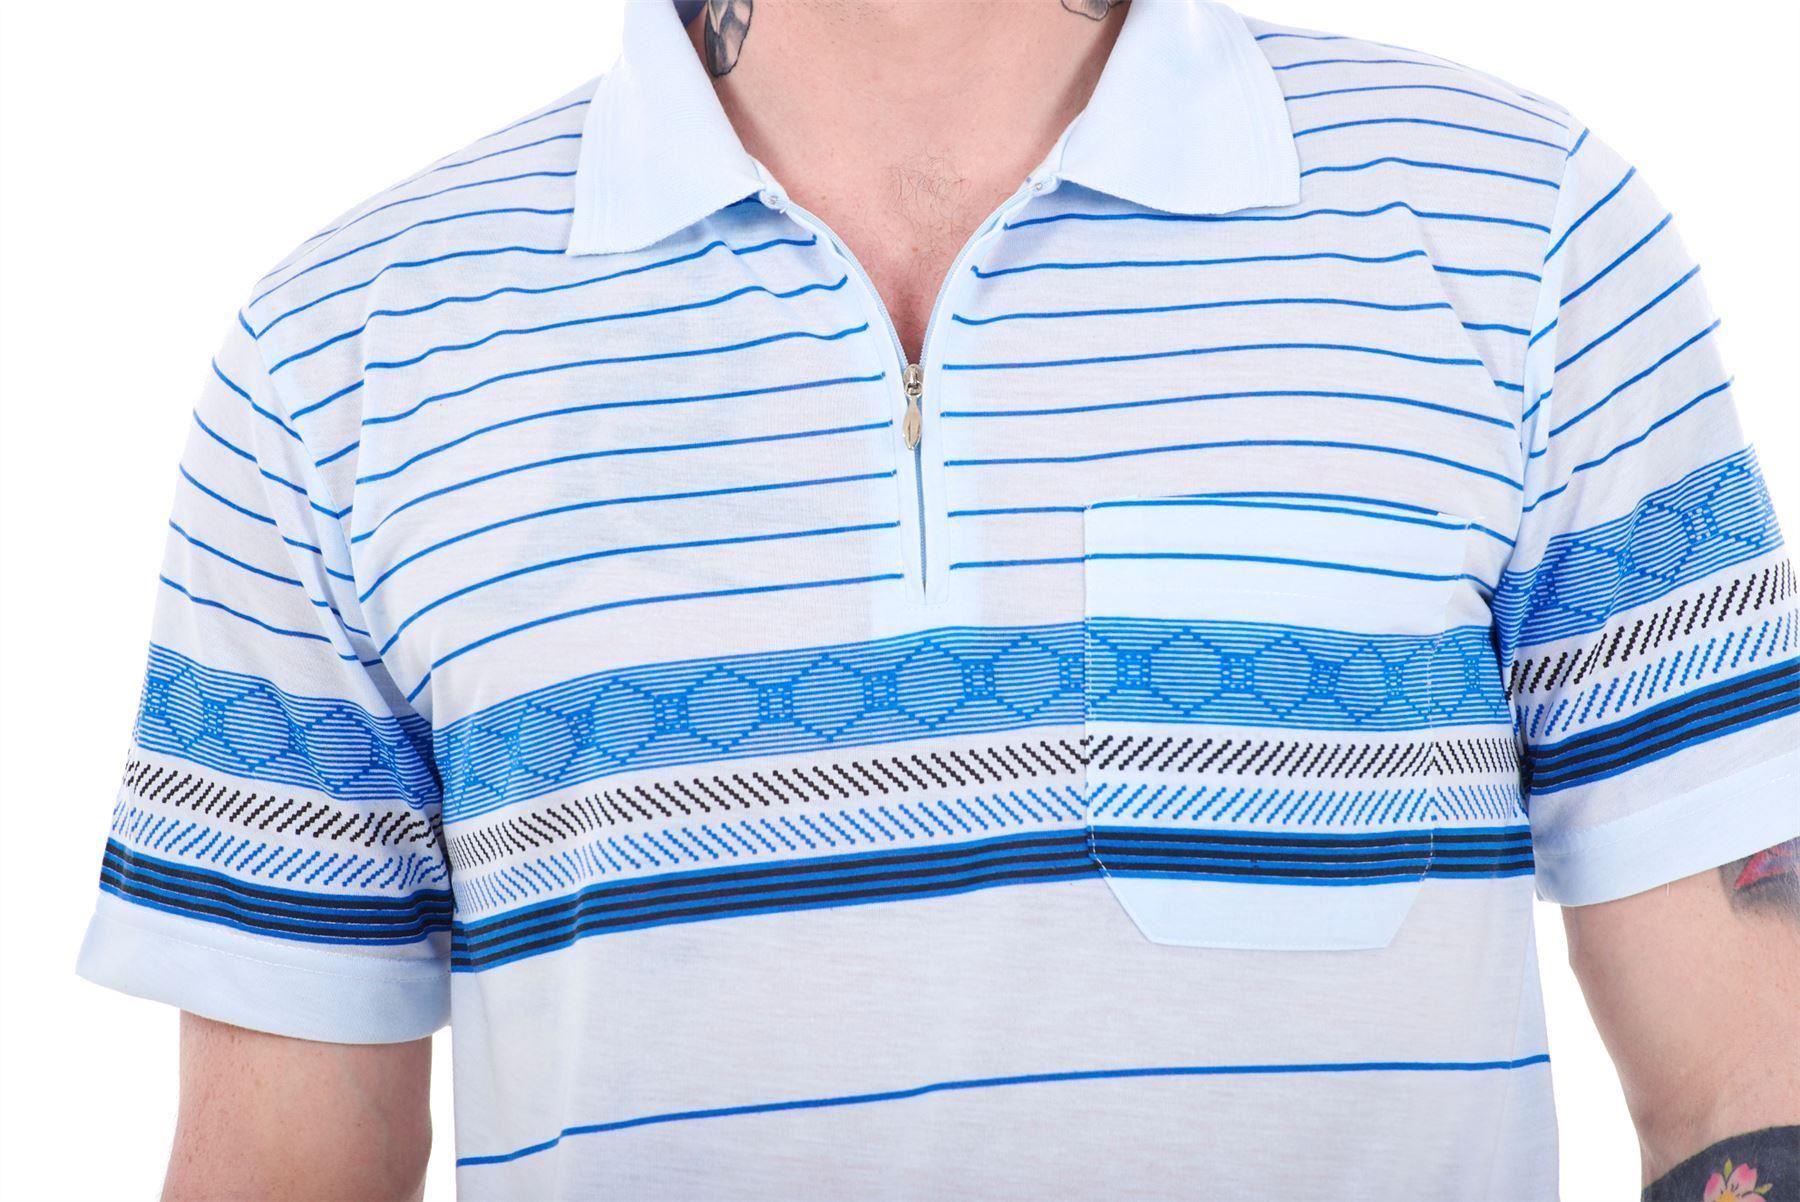 Aztèque Imprimé Polo Homme Causal Shirt Summer Loose T xRAqI8Z